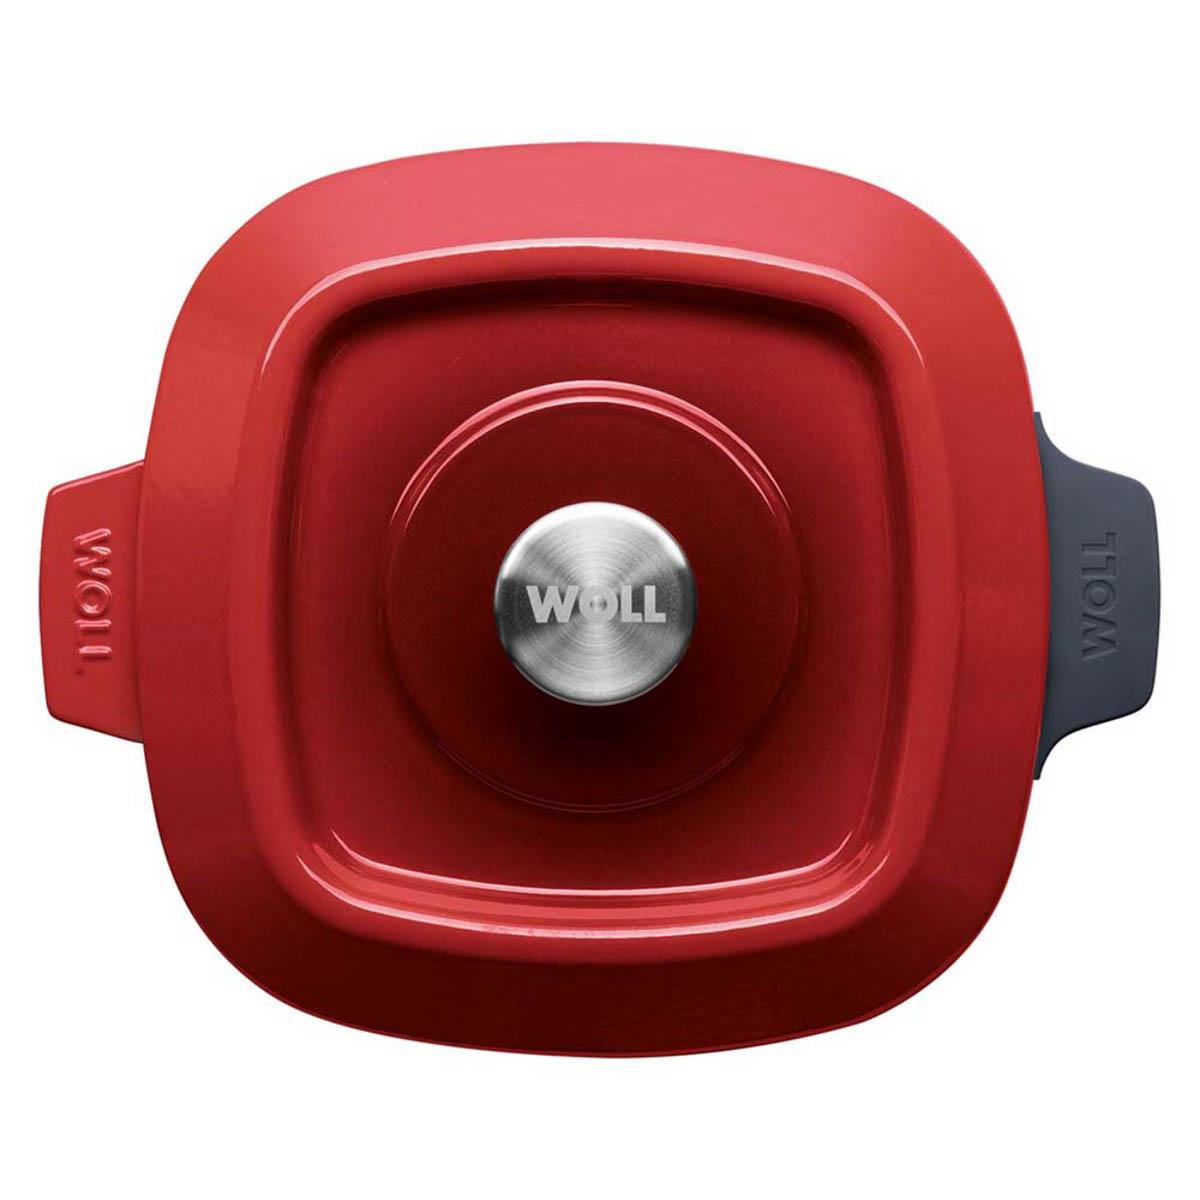 Woll Iron Kasserolle 24 x 24 cm Rot